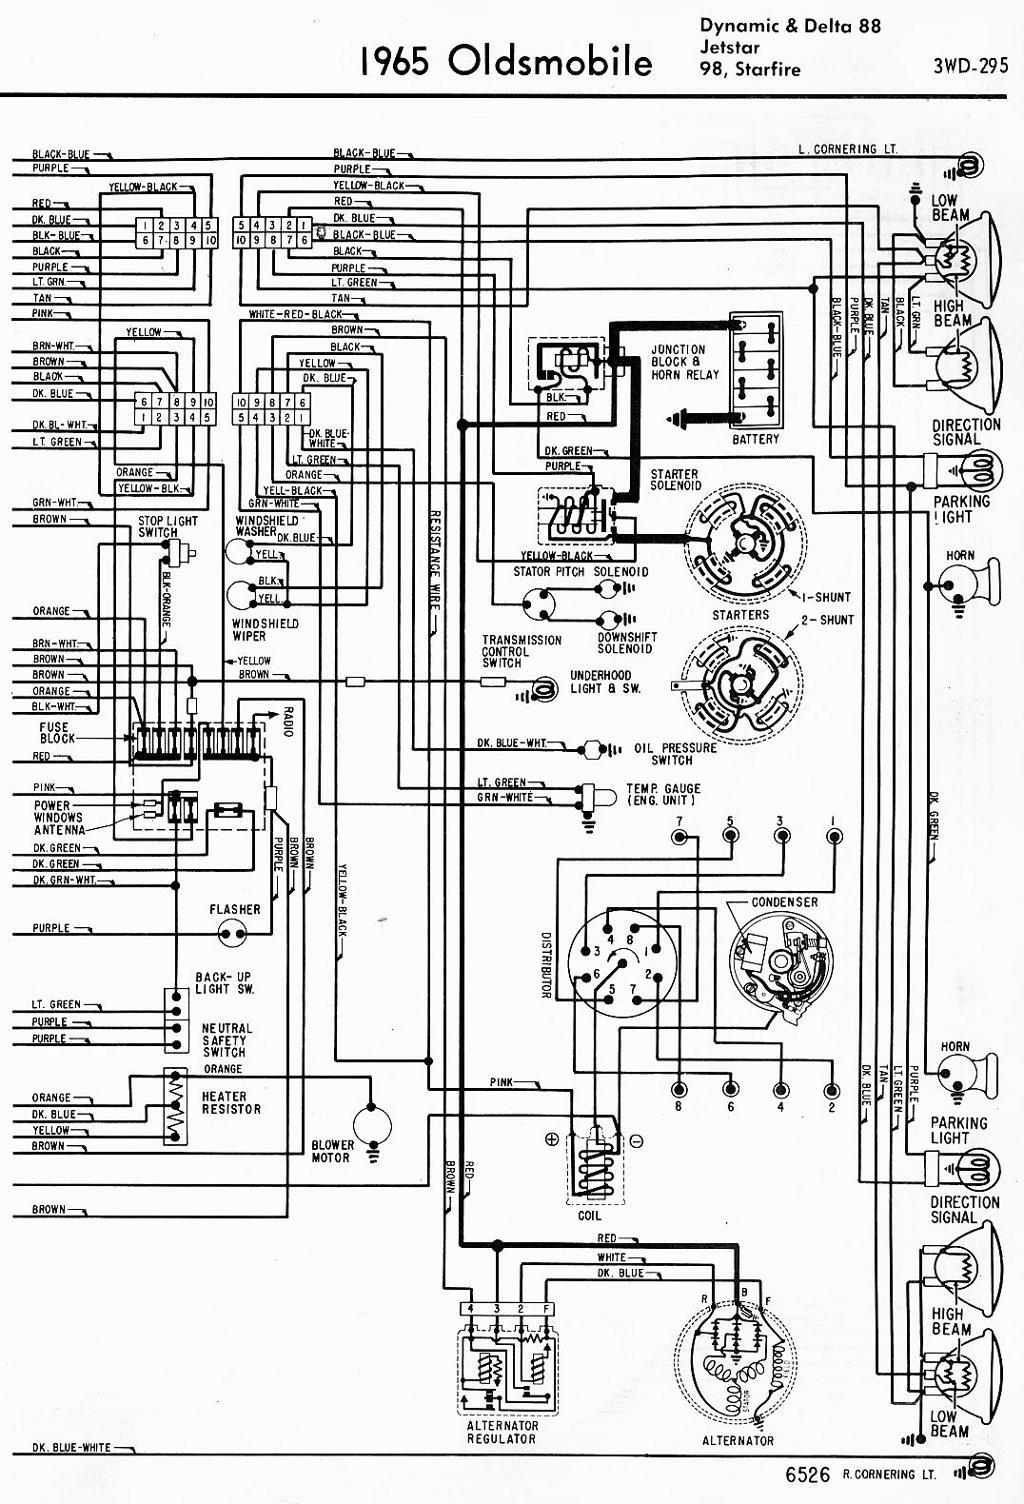 hight resolution of nissan tiida air con wiring diagram wiring schematic 1987 nissan pickup wiring diagram nissan tiida a c